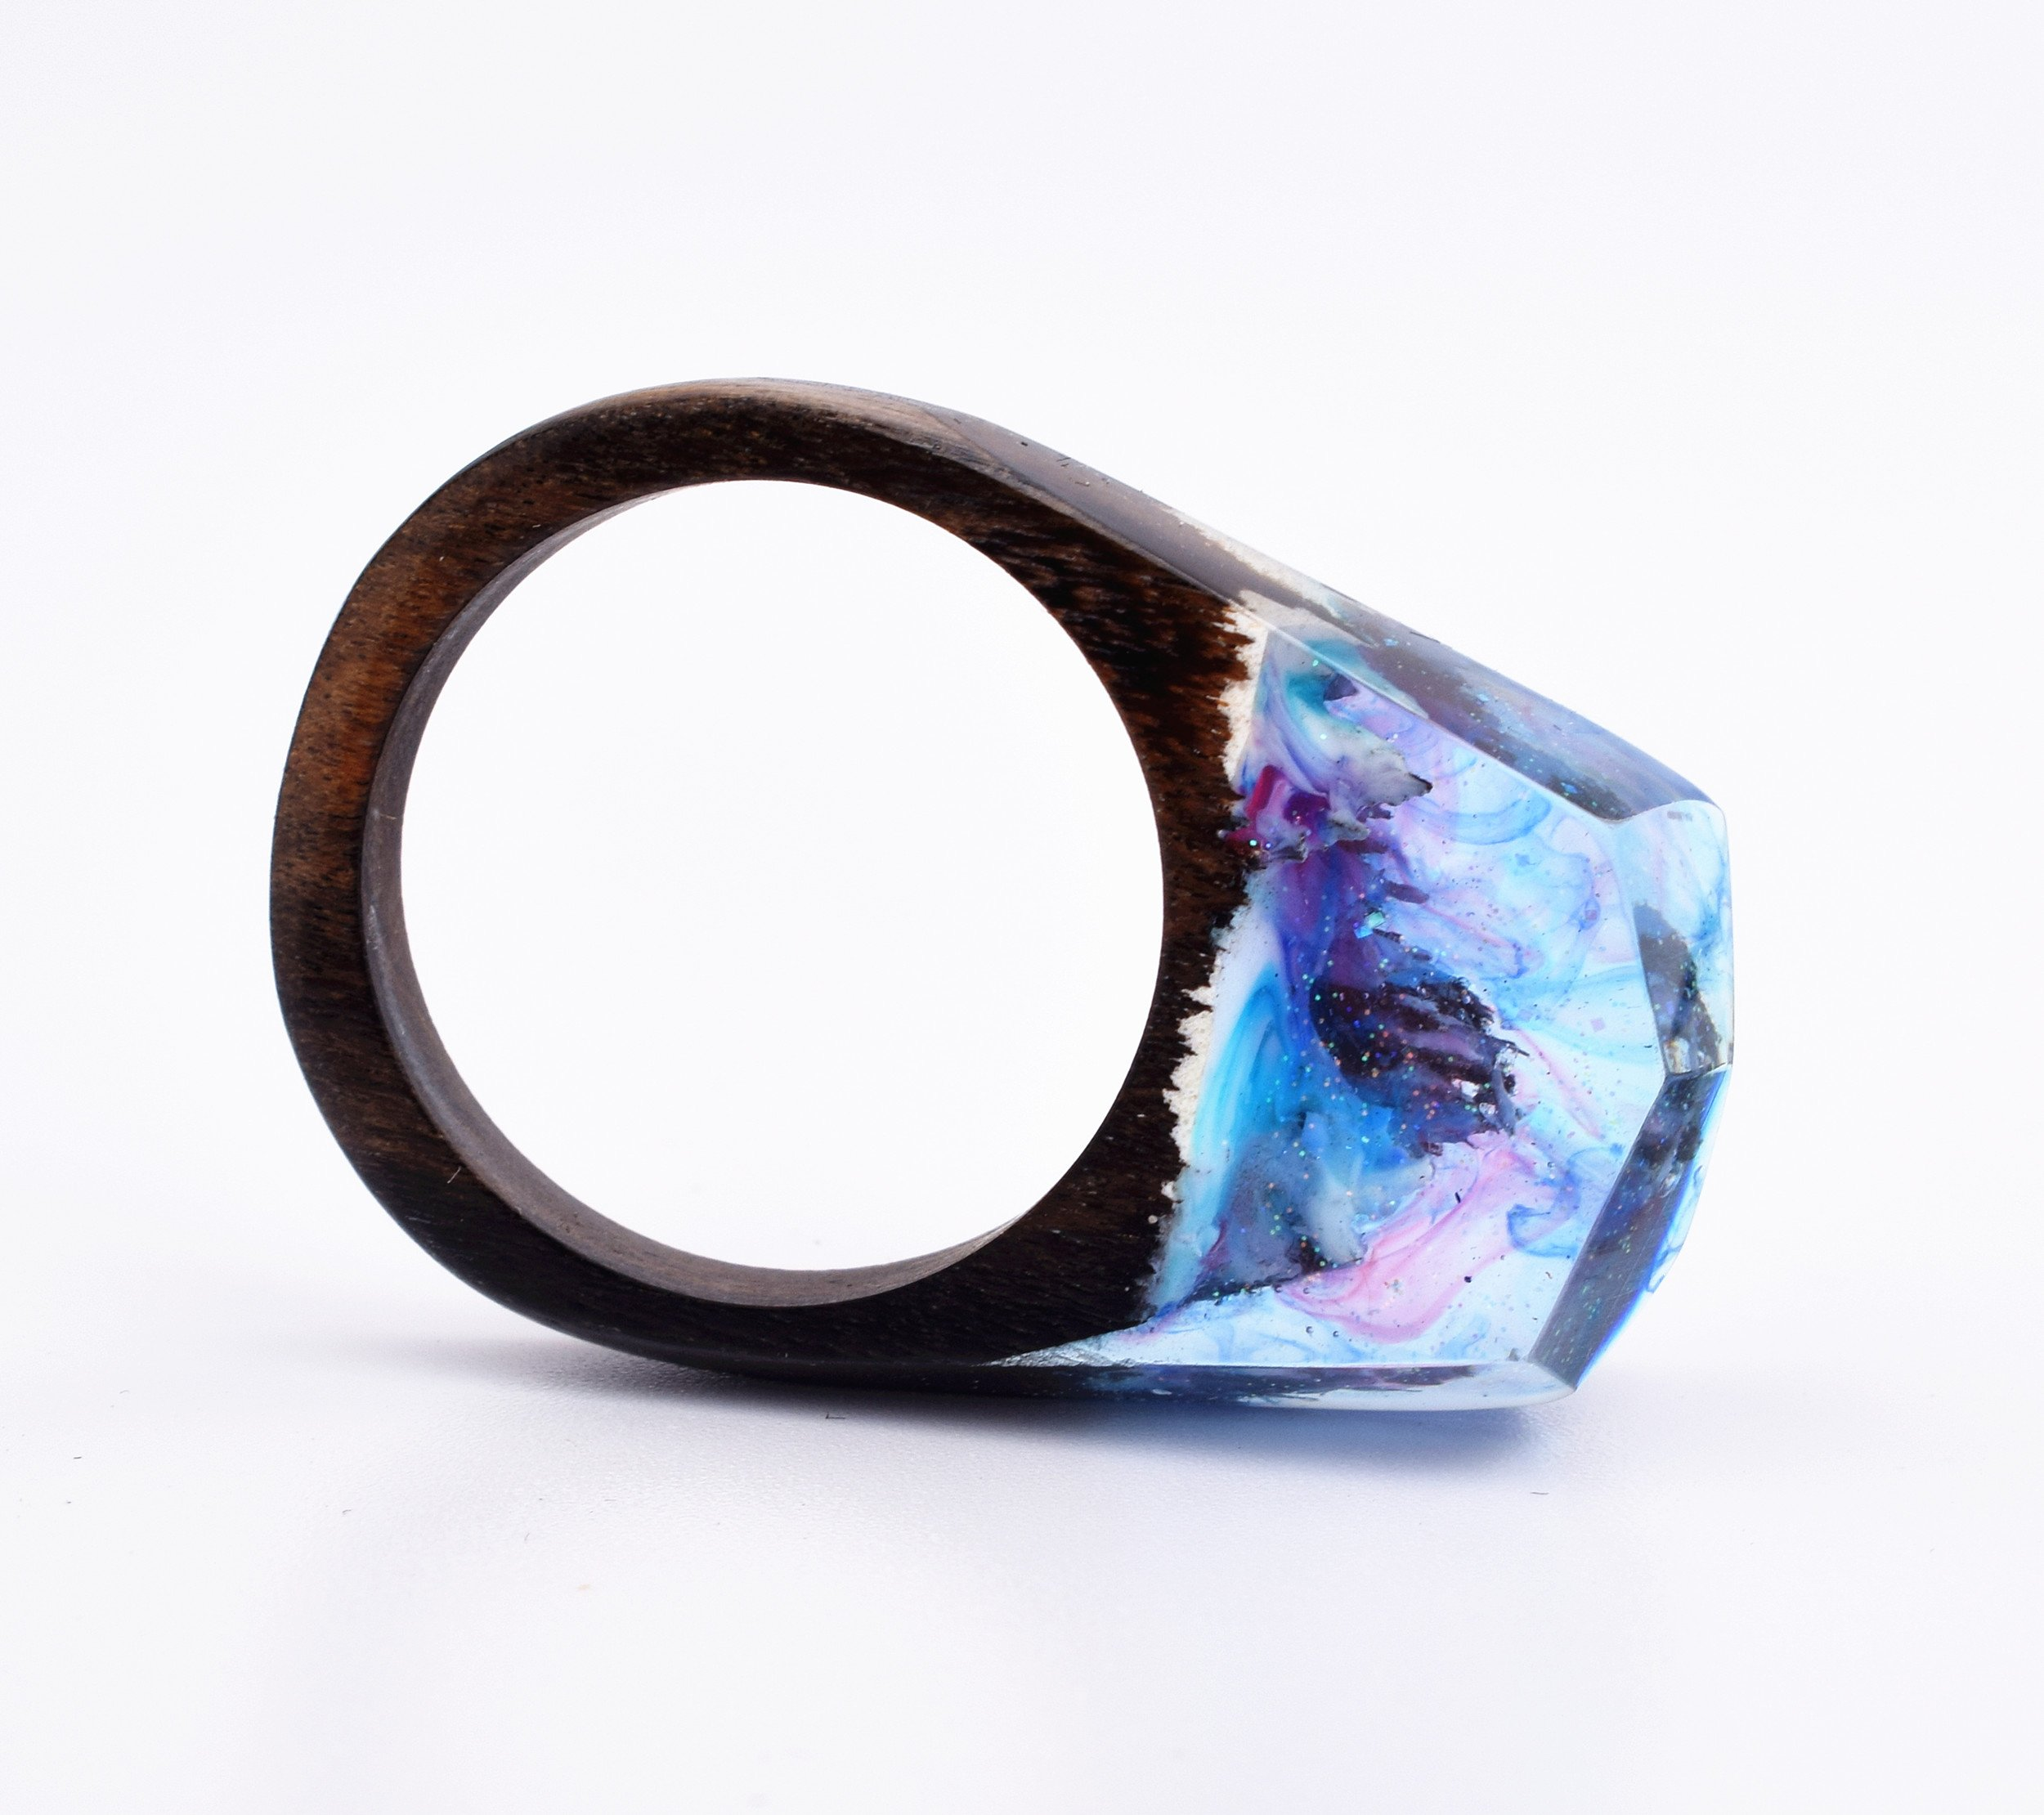 Heyou Love Handmade Wood Resin Ring With Secret Sky Landscape Inside Jewelry by Heyou Love (Image #3)